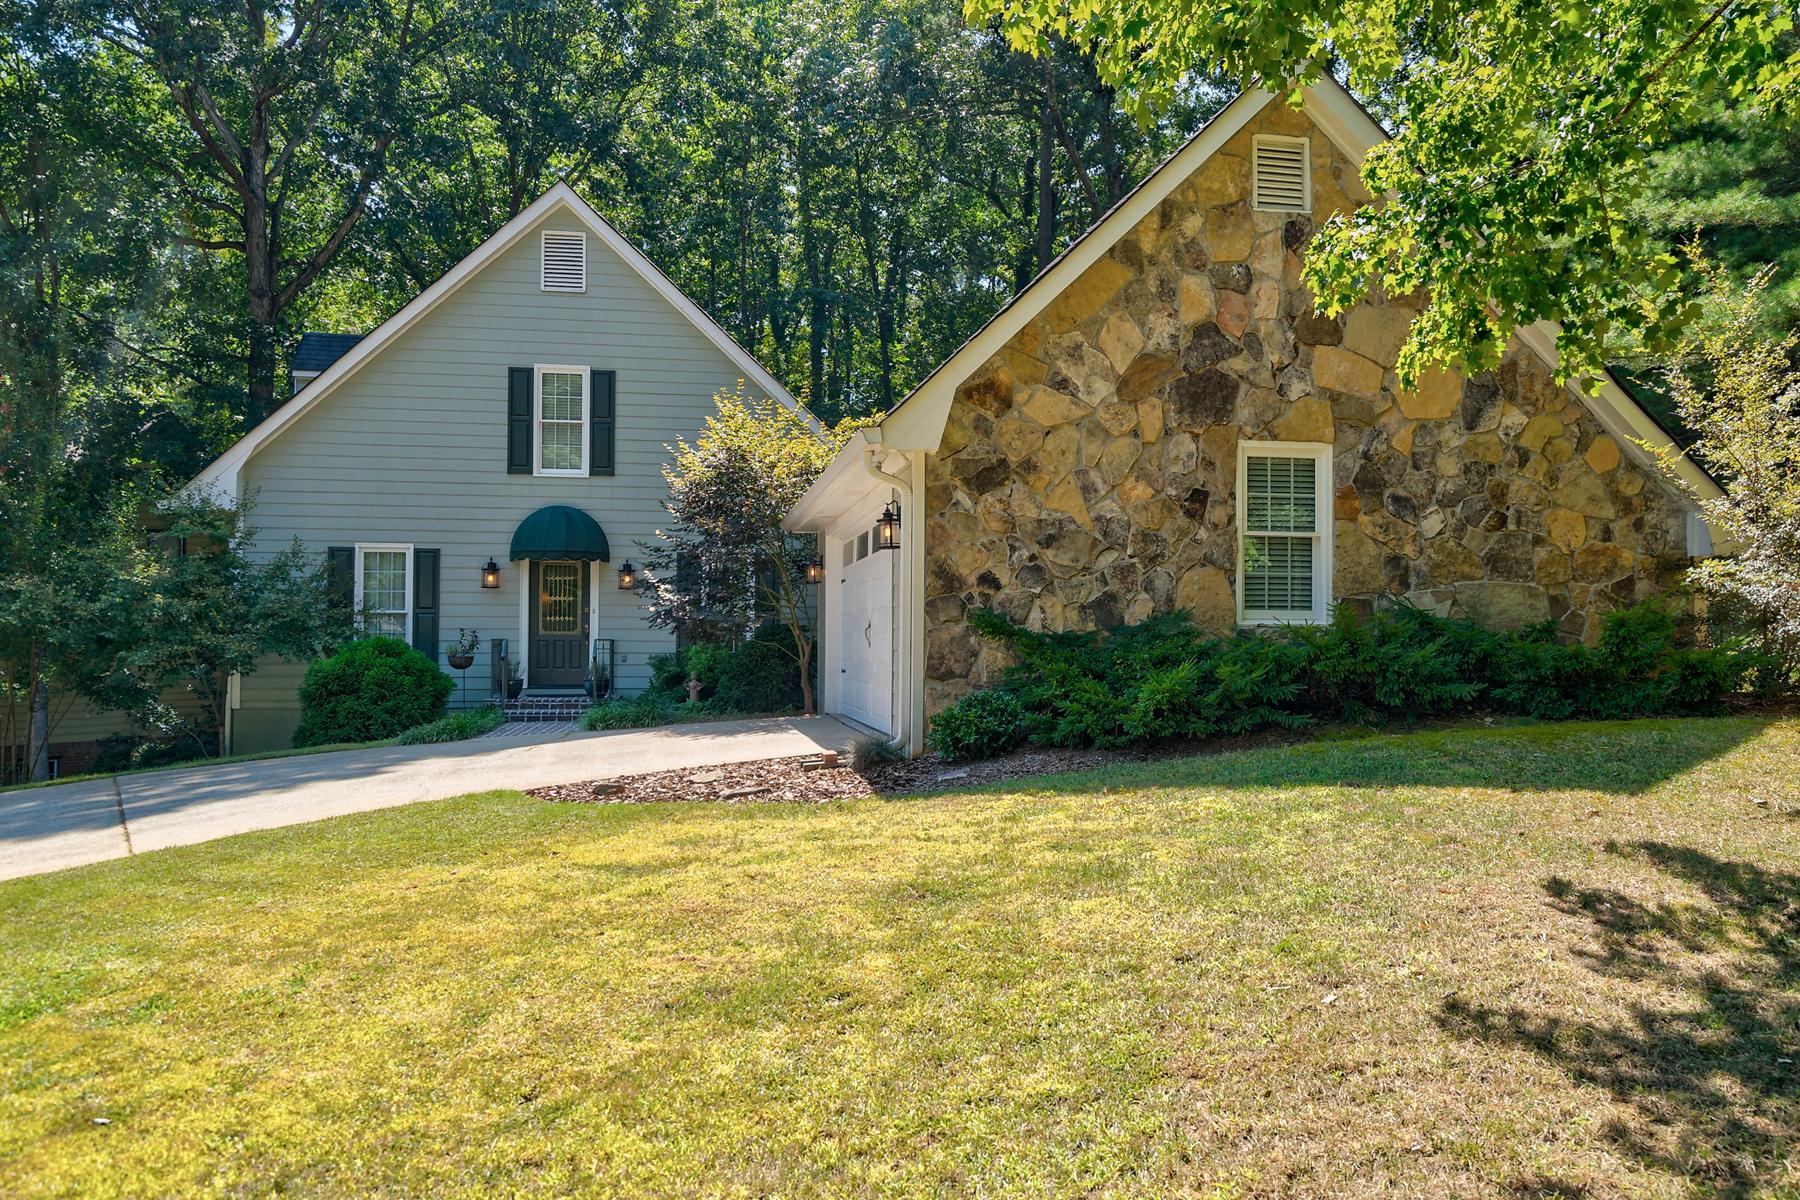 Single Family Homes のために 売買 アット Beautifully Updated In Horseshoe Bend 405 Lofty Ln, Roswell, ジョージア 30076 アメリカ